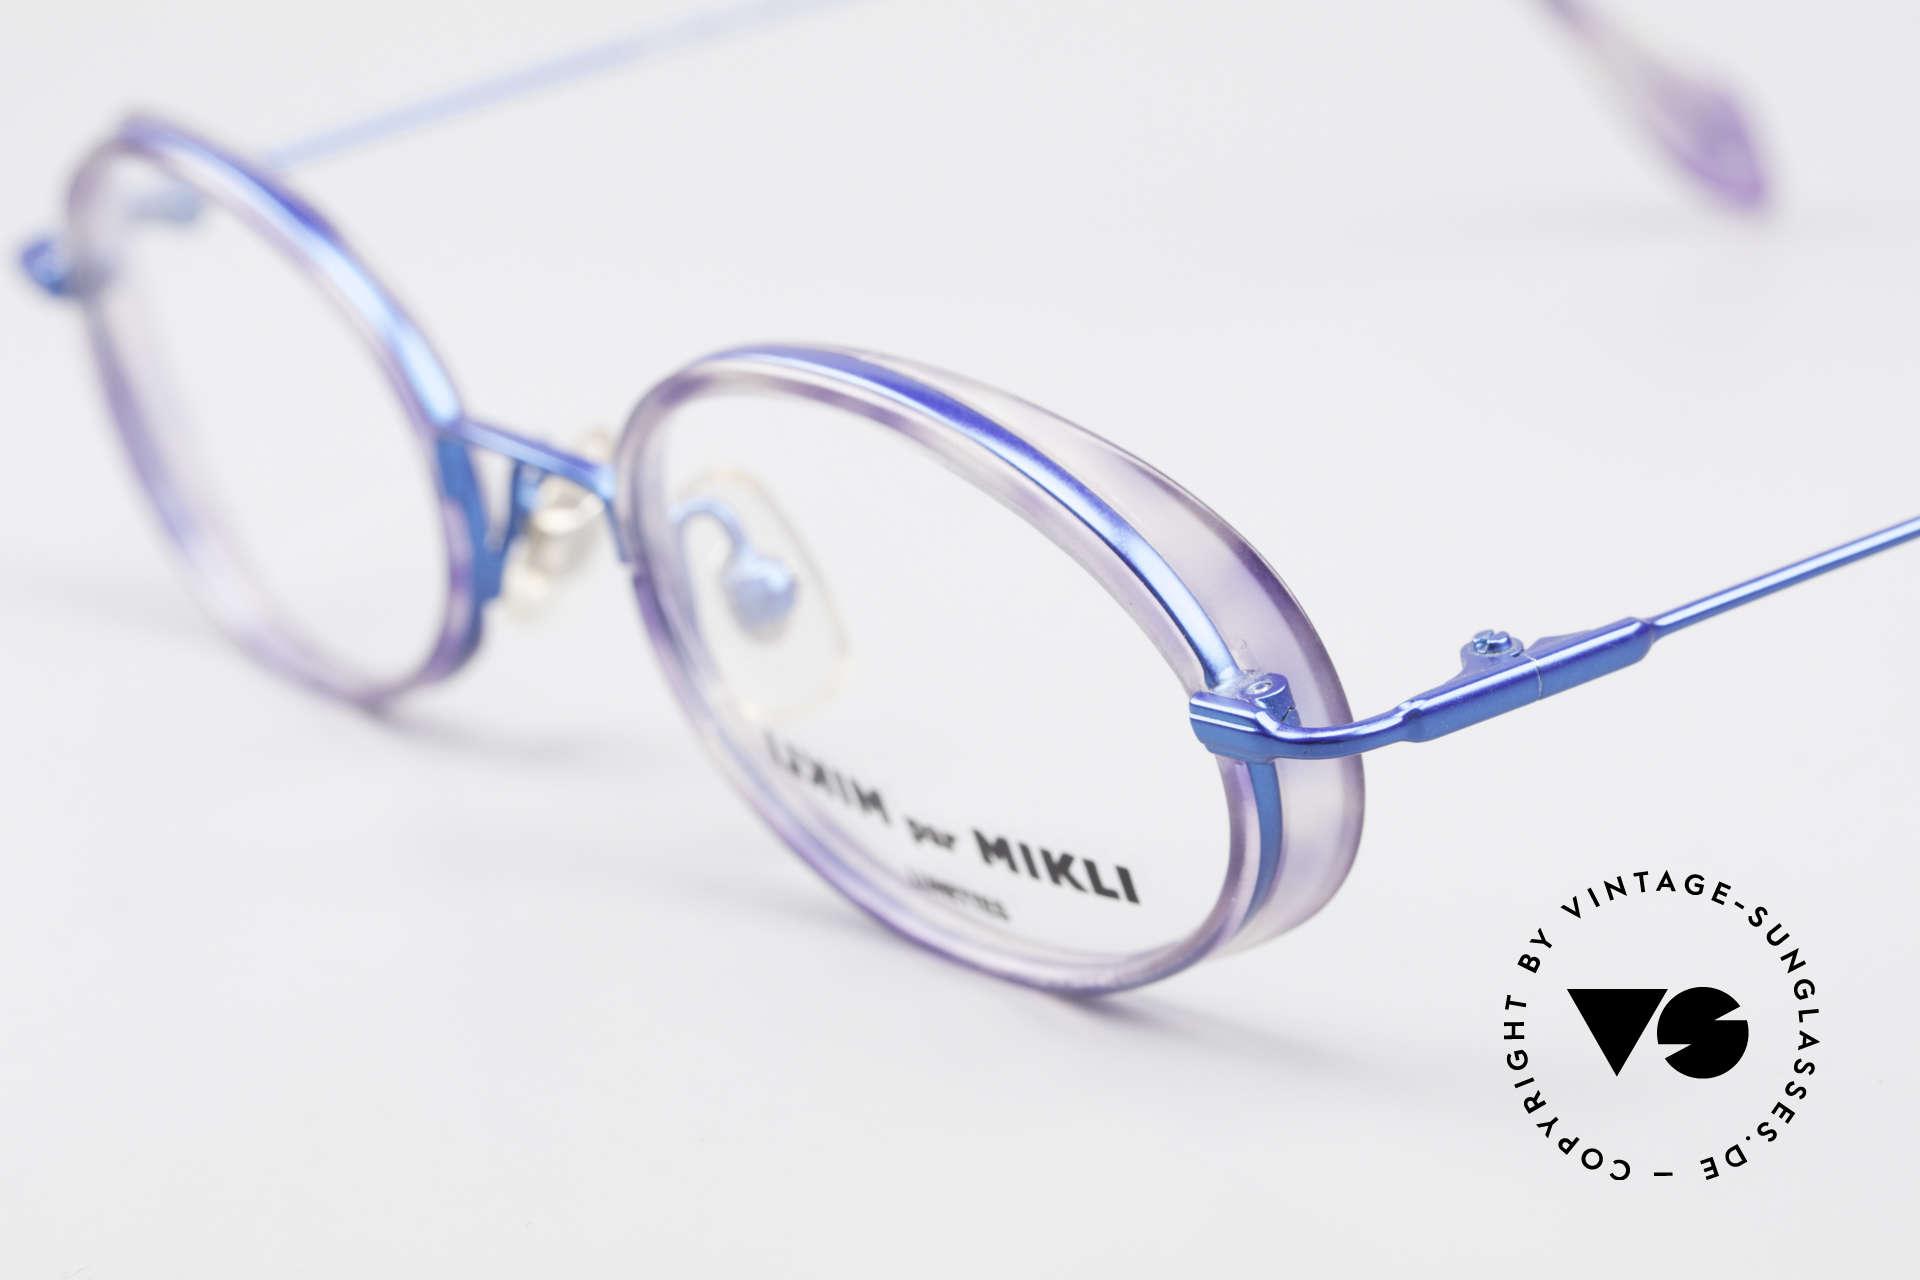 Alain Mikli 6719 / 2403 Designer Ladies Vintage Frame, unworn rarity (like all our vintage Alain Mikli eyewear), Made for Women